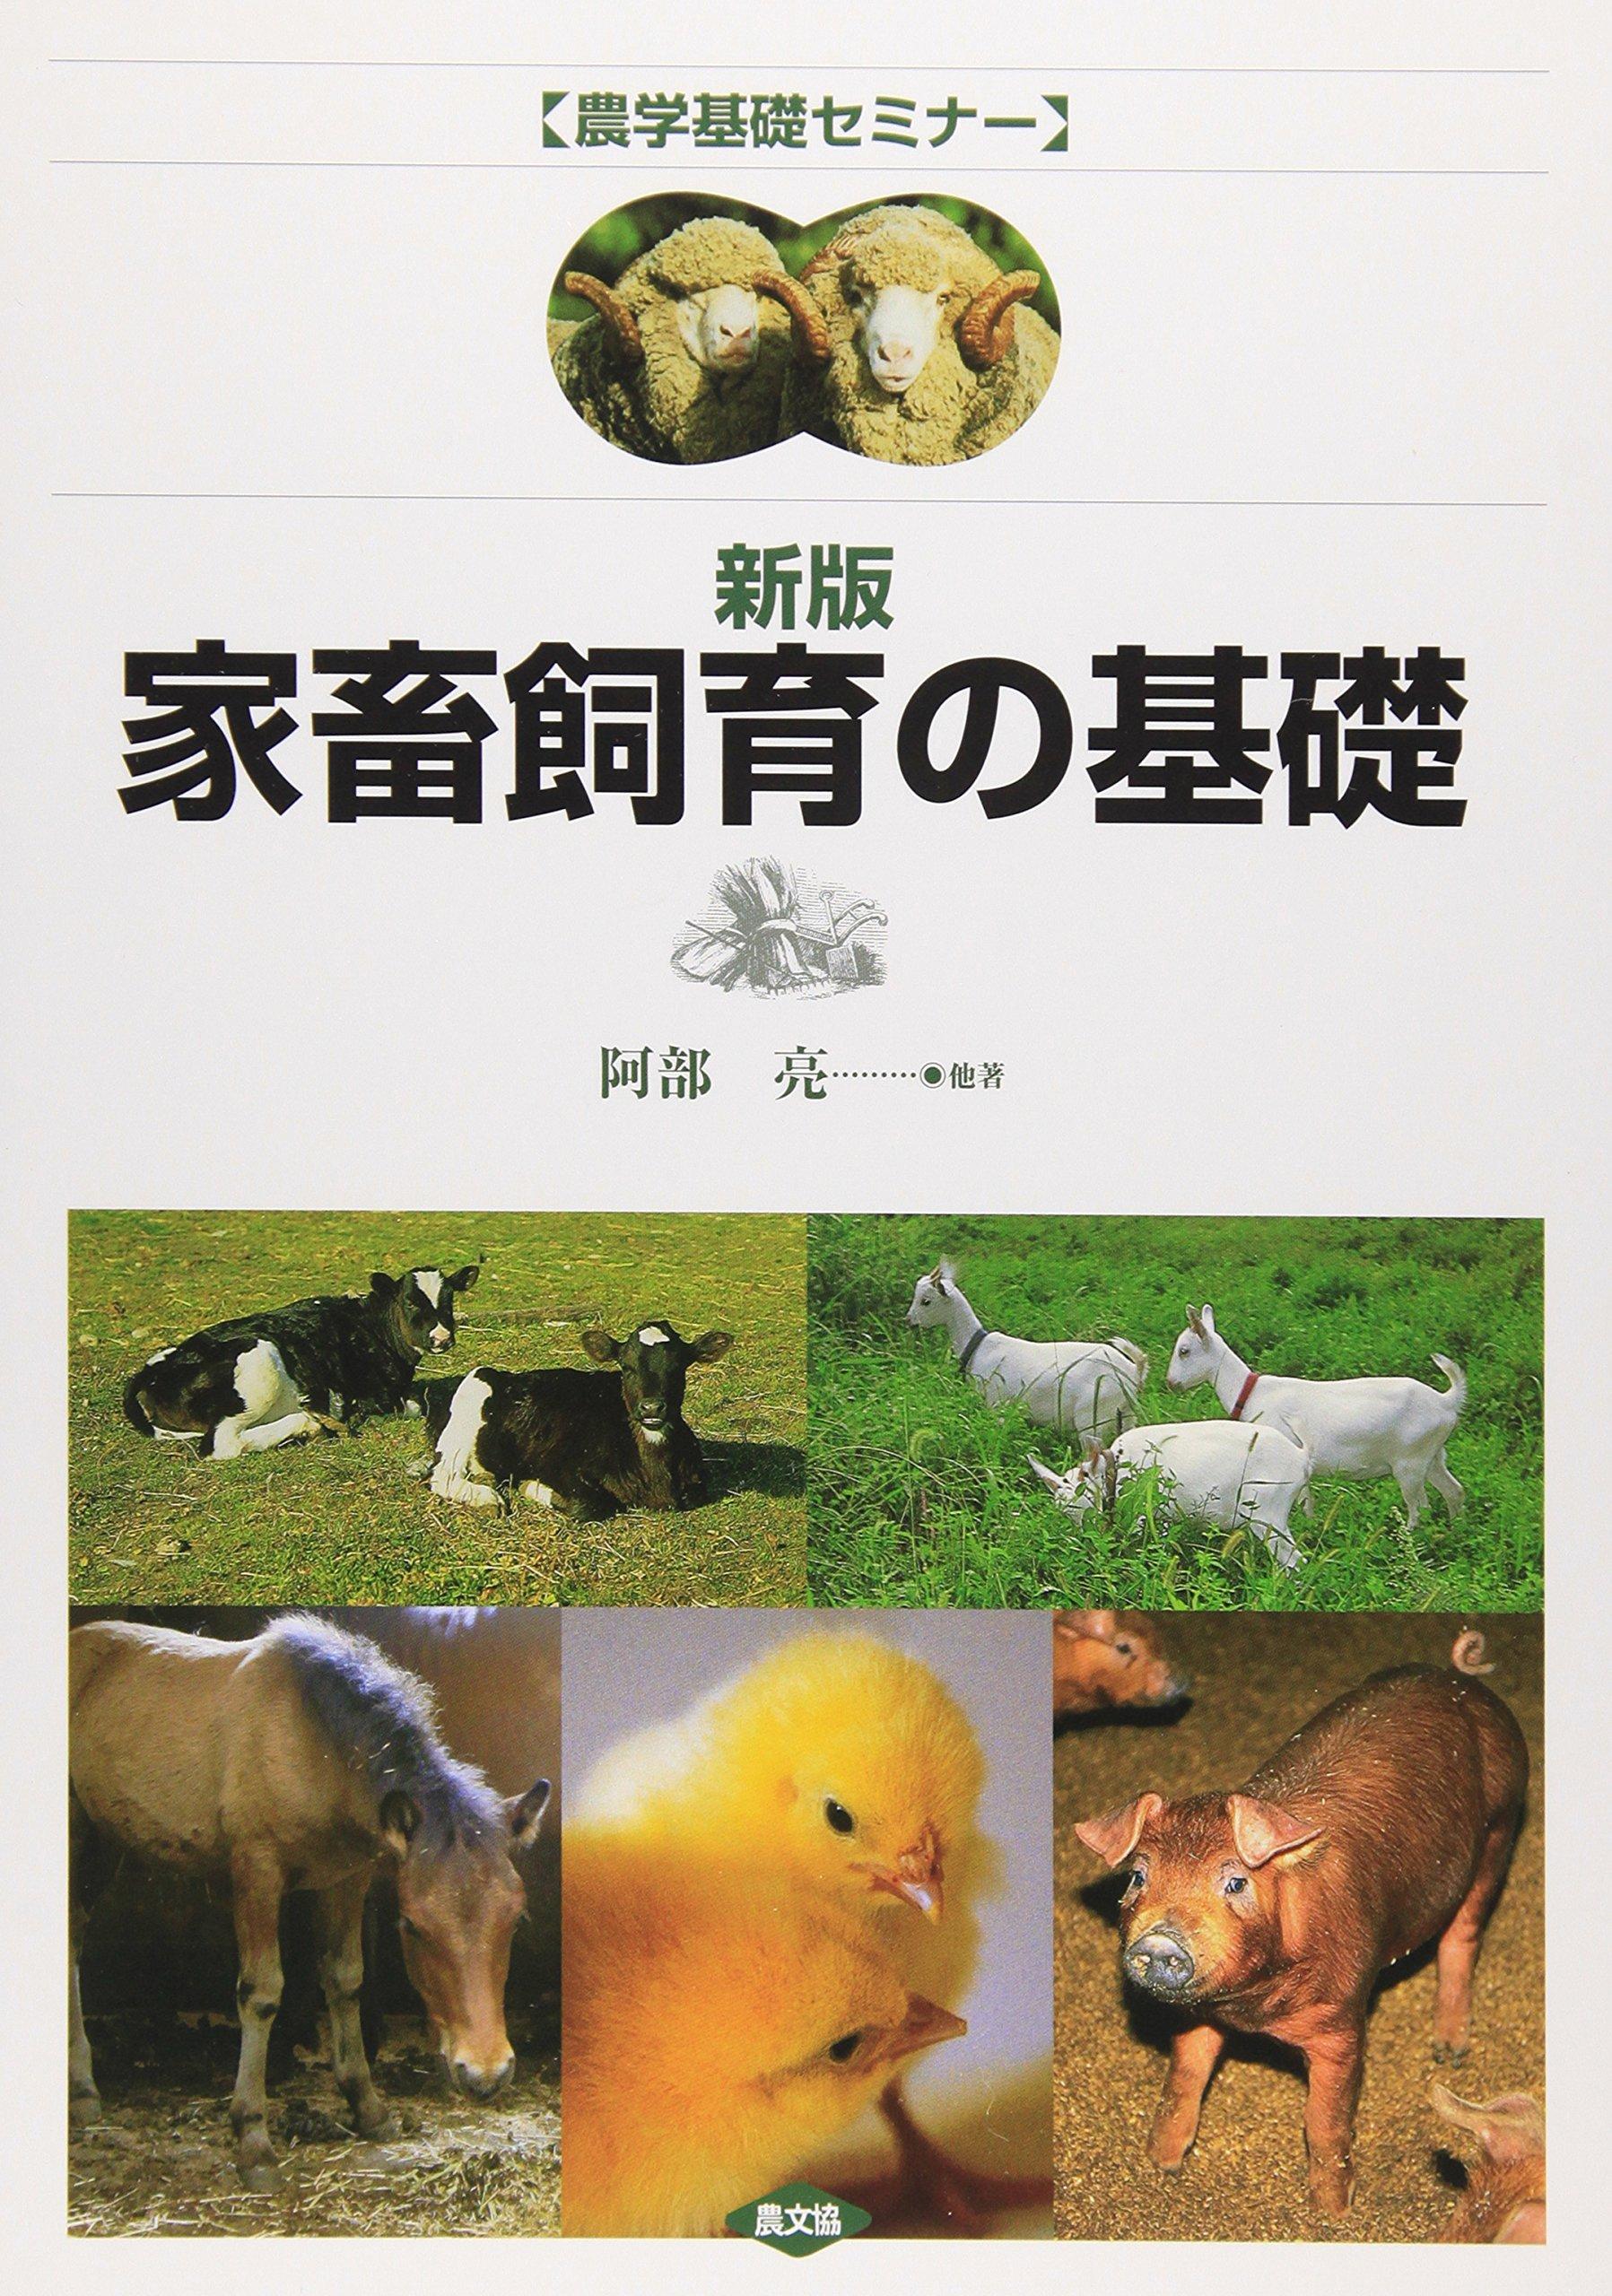 家畜飼育の基礎 (農学基礎セミナー) | 阿部 亮 |本 | 通販 | Amazon